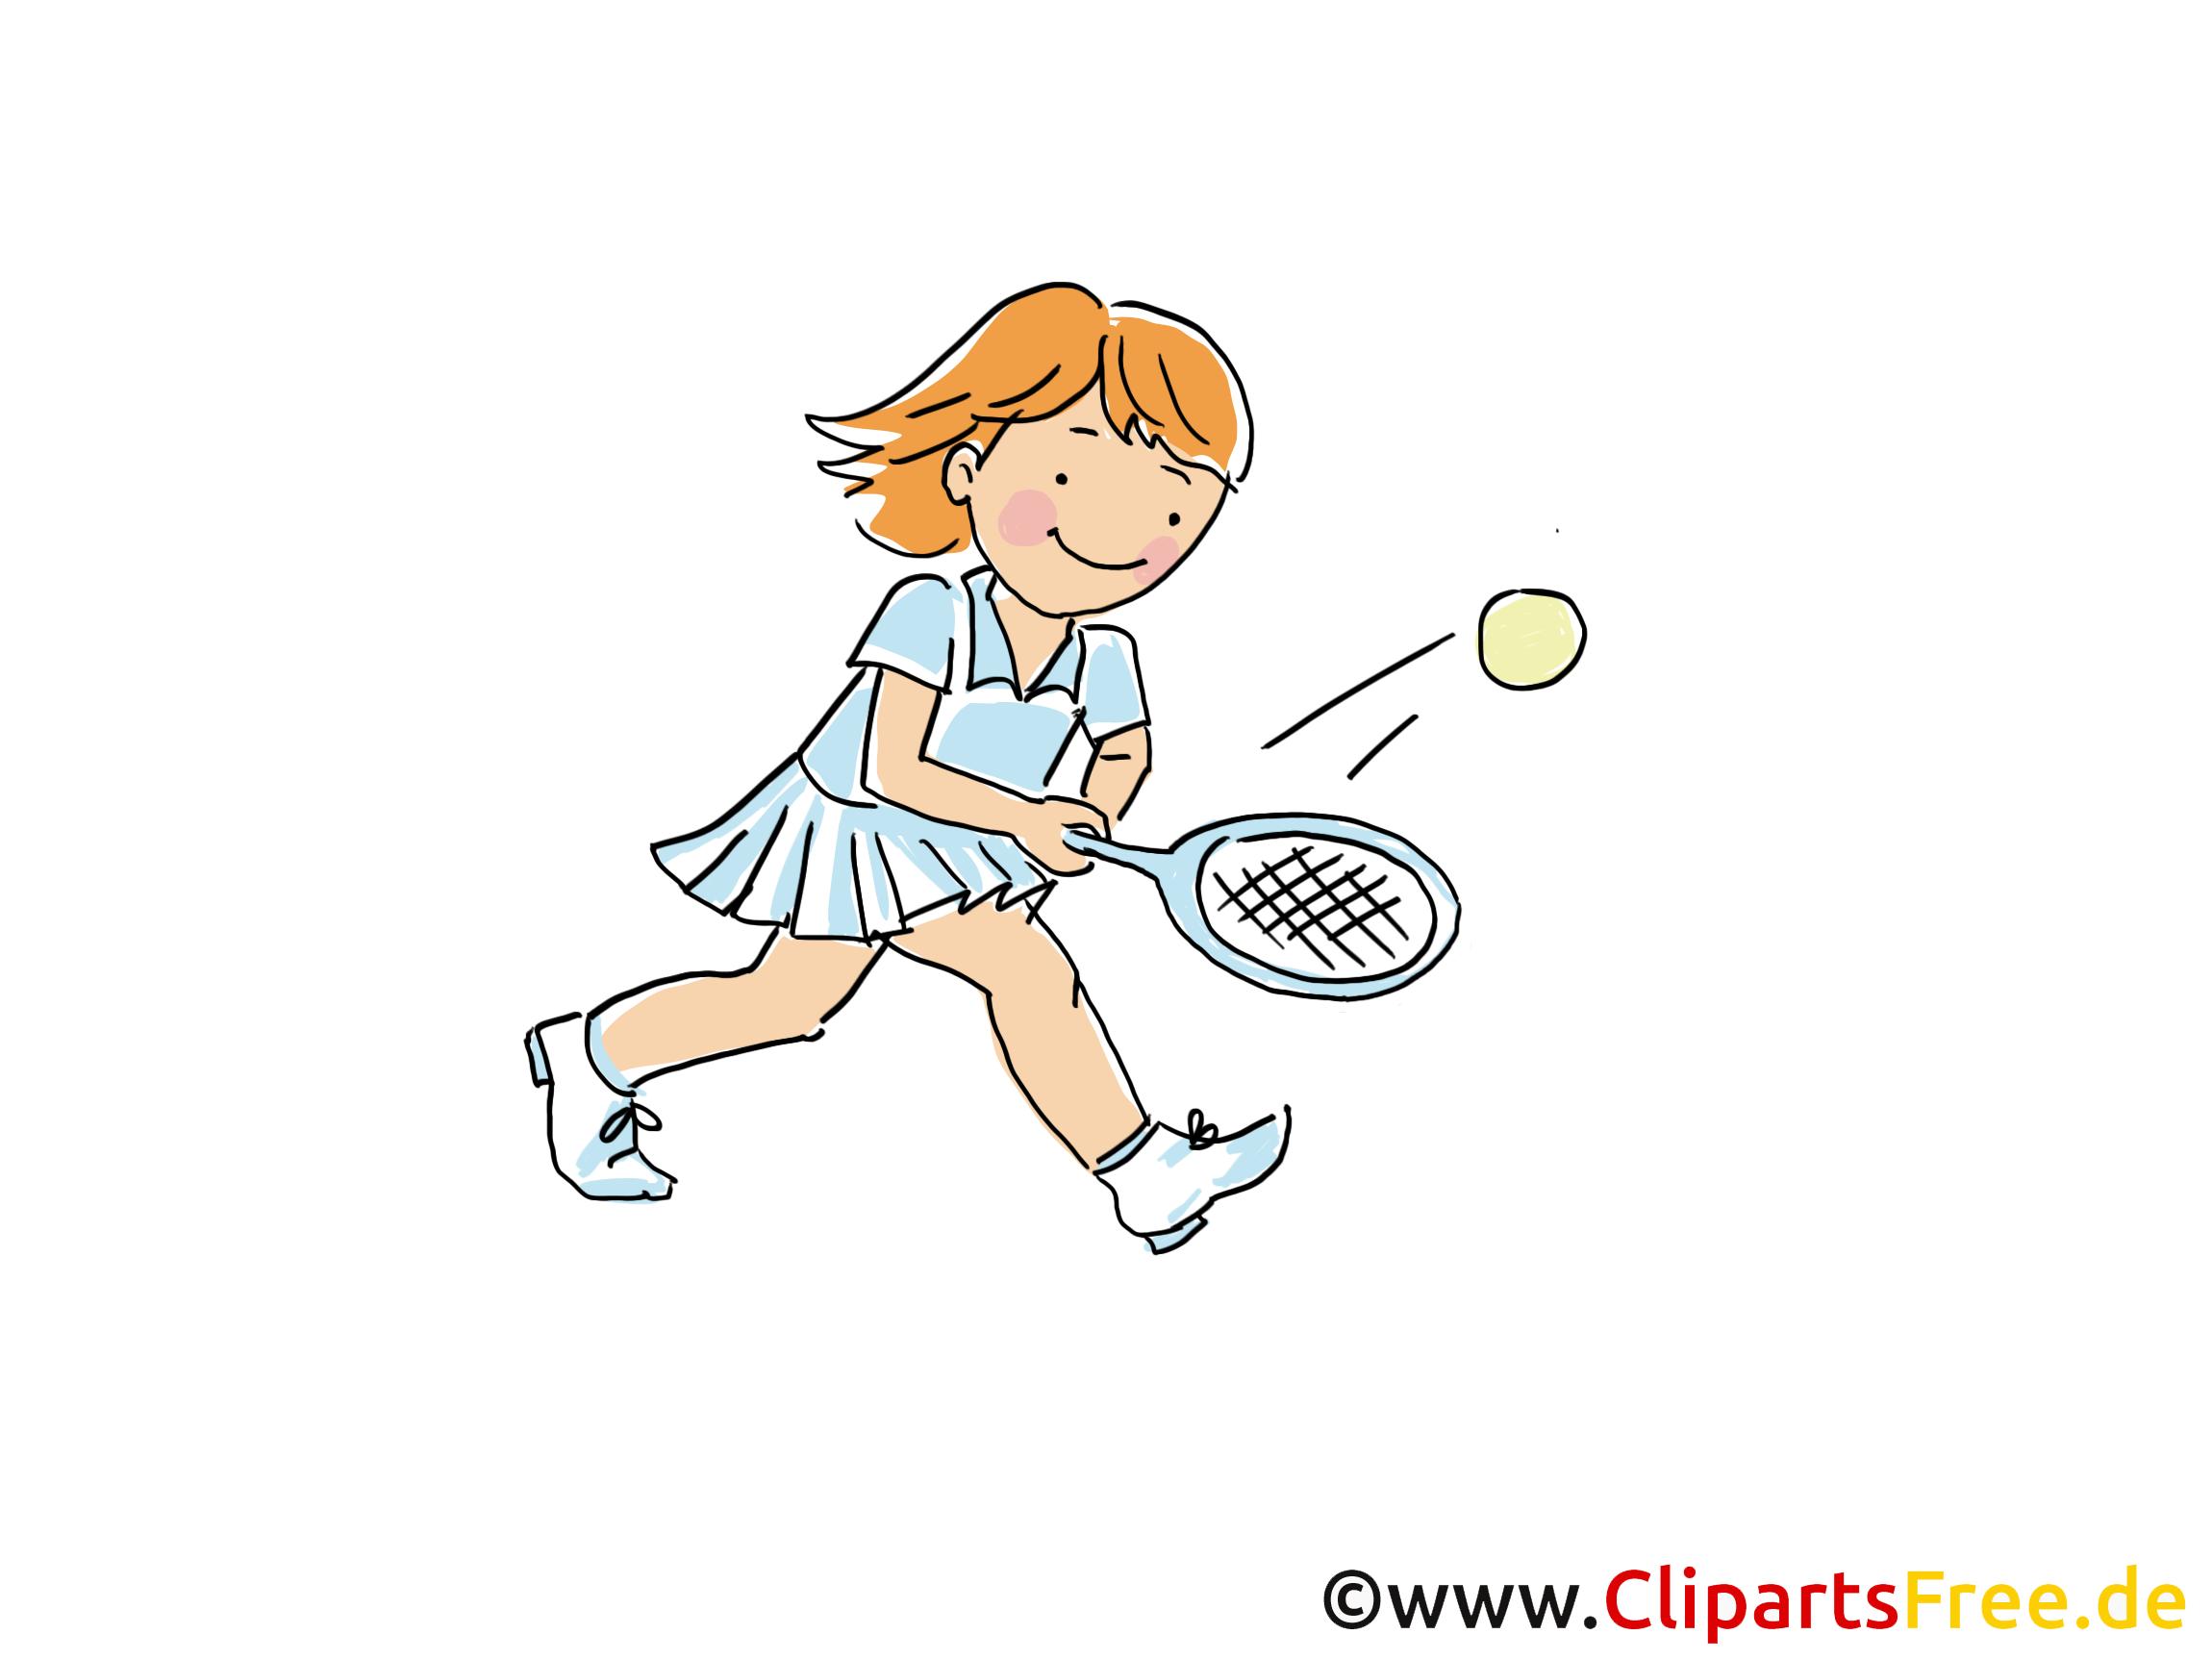 Sport Comic Bilder